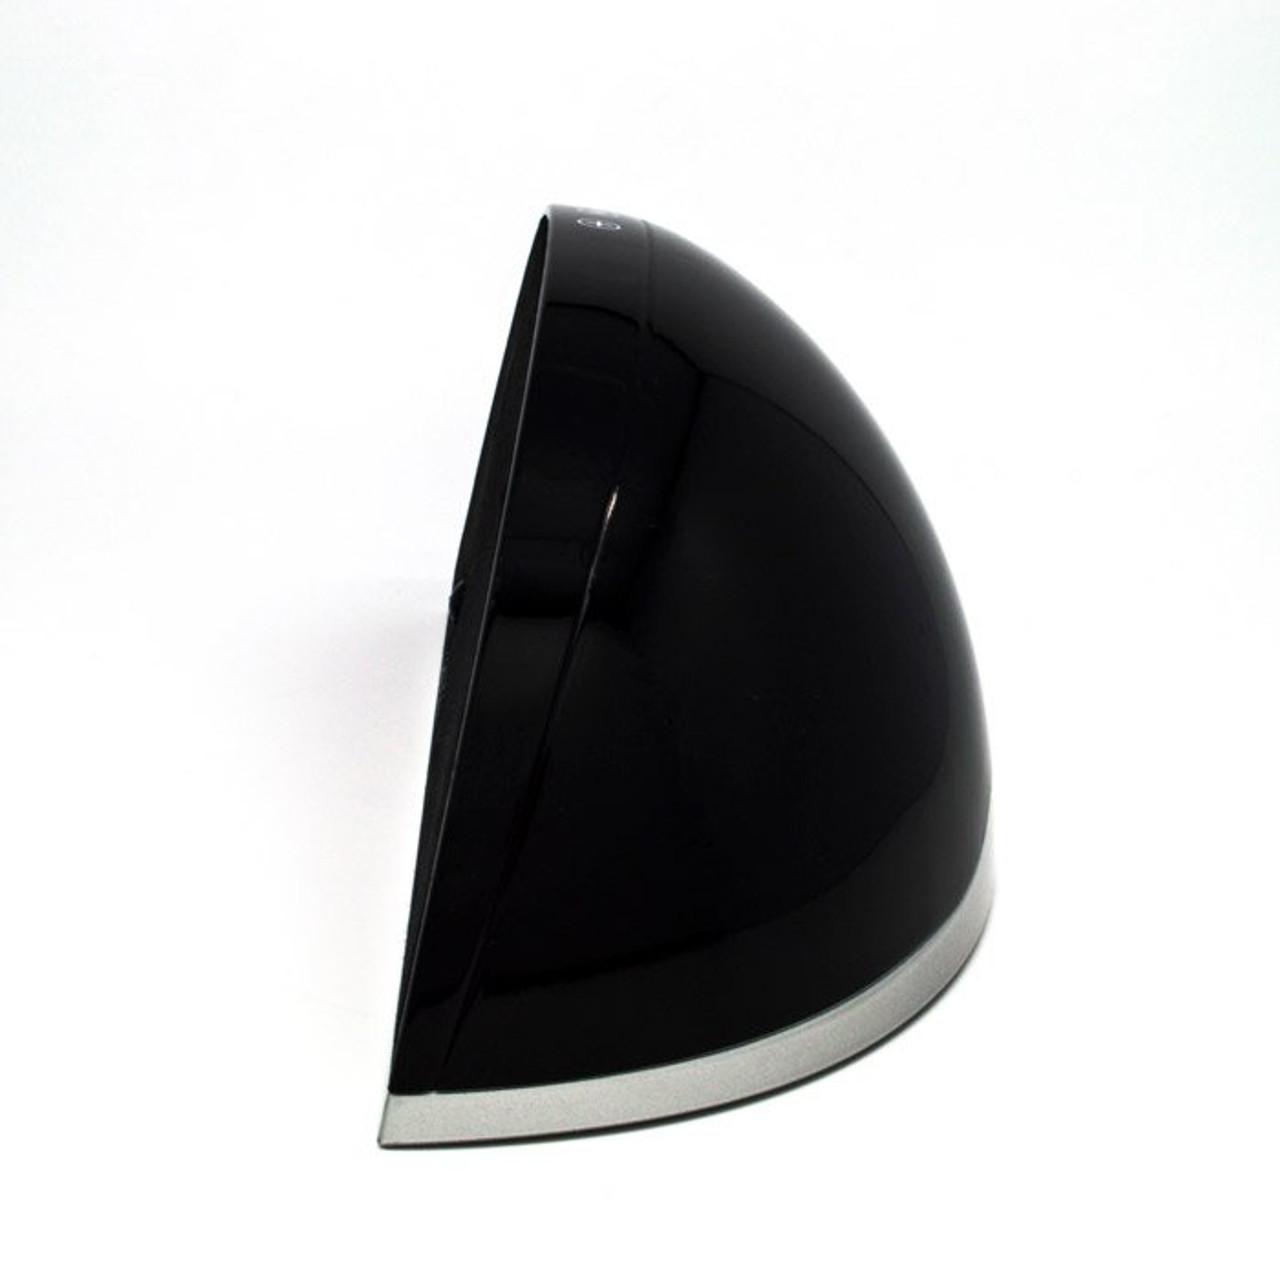 Zone Shield 4K Bluetooth Speaker Hidden Spy Camera and Recorder